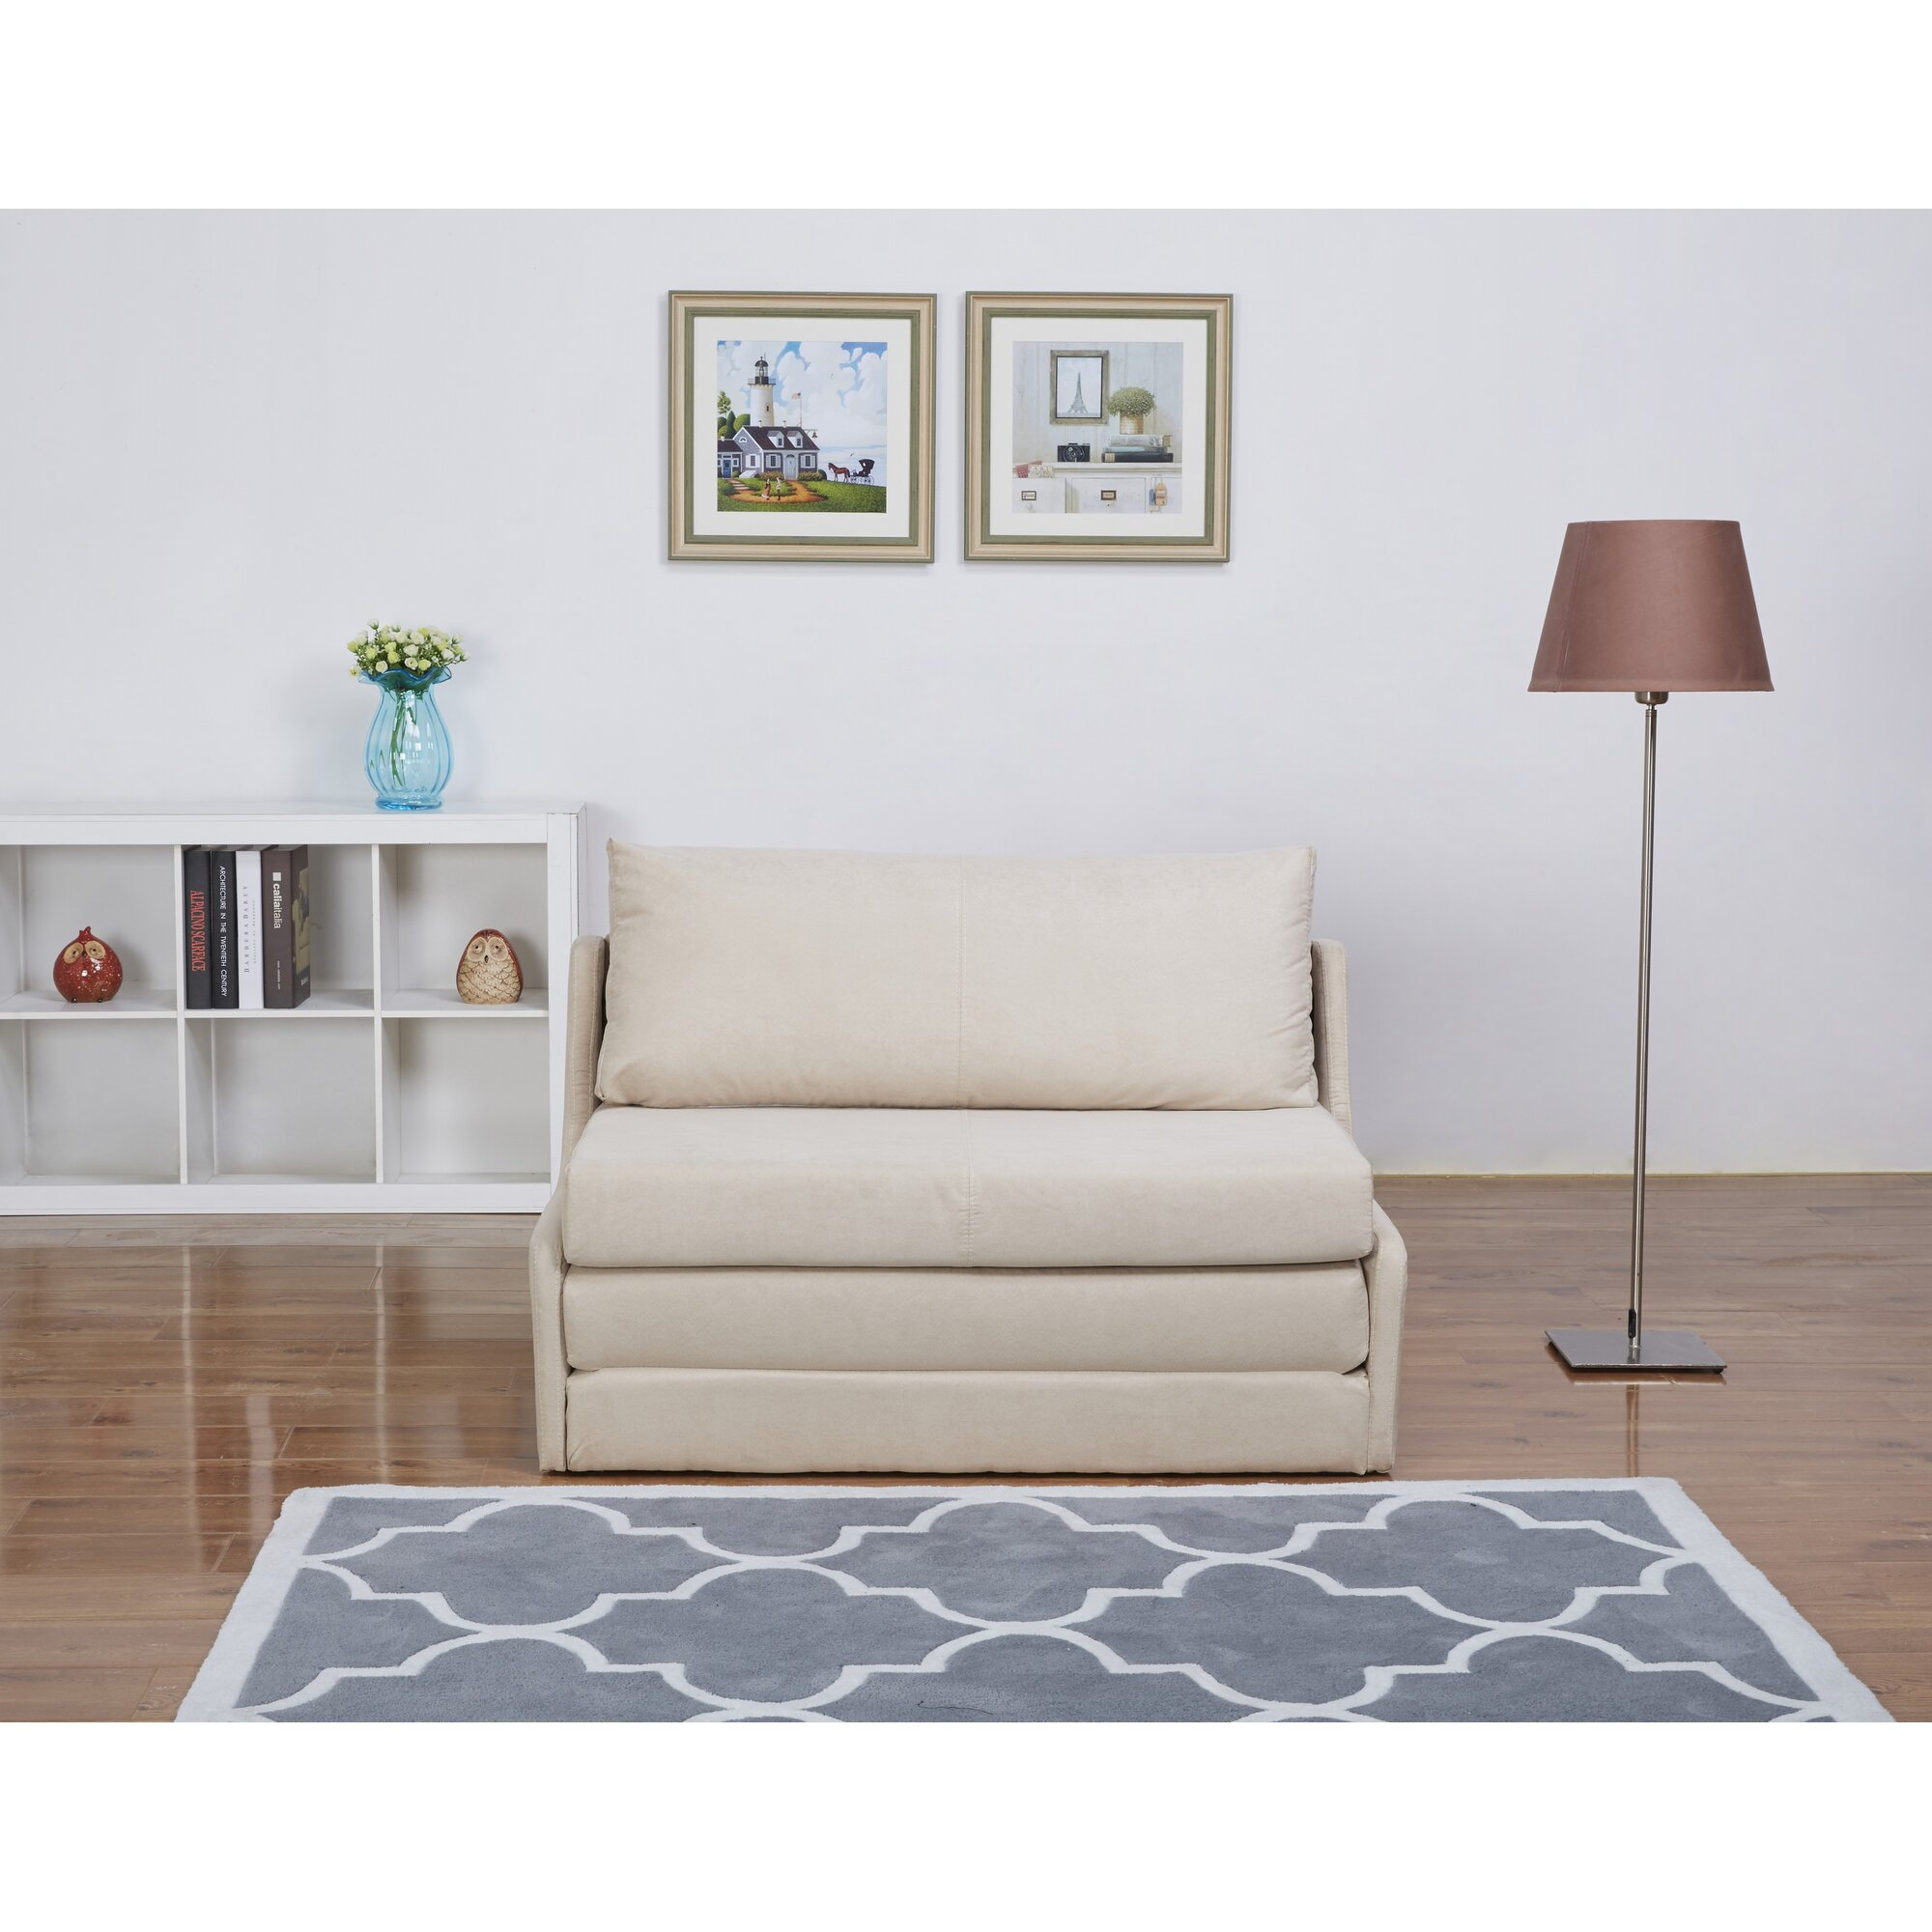 leader lifestyle 2 sitzer schlafsofa dosie. Black Bedroom Furniture Sets. Home Design Ideas